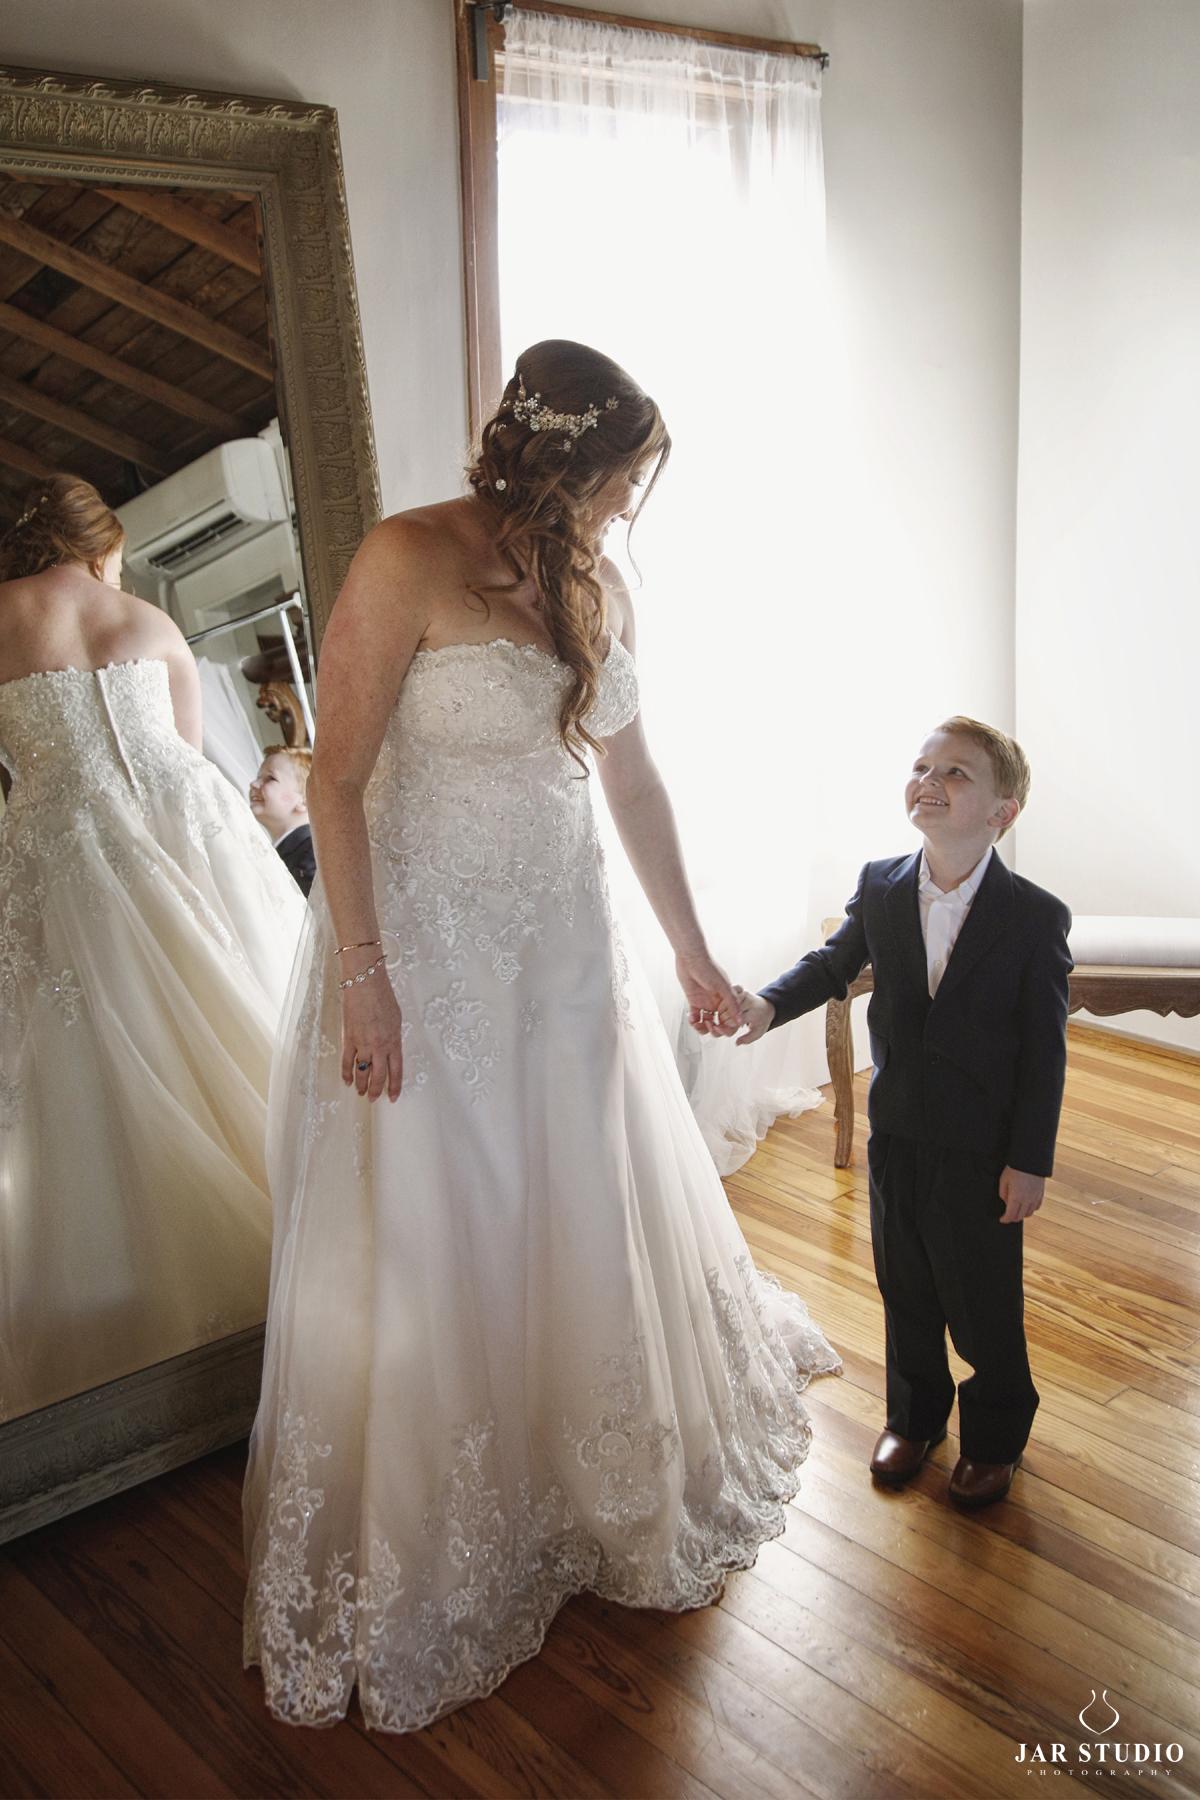 13-mother-son-cute-moment-wedding-day-jarstudio.JPG